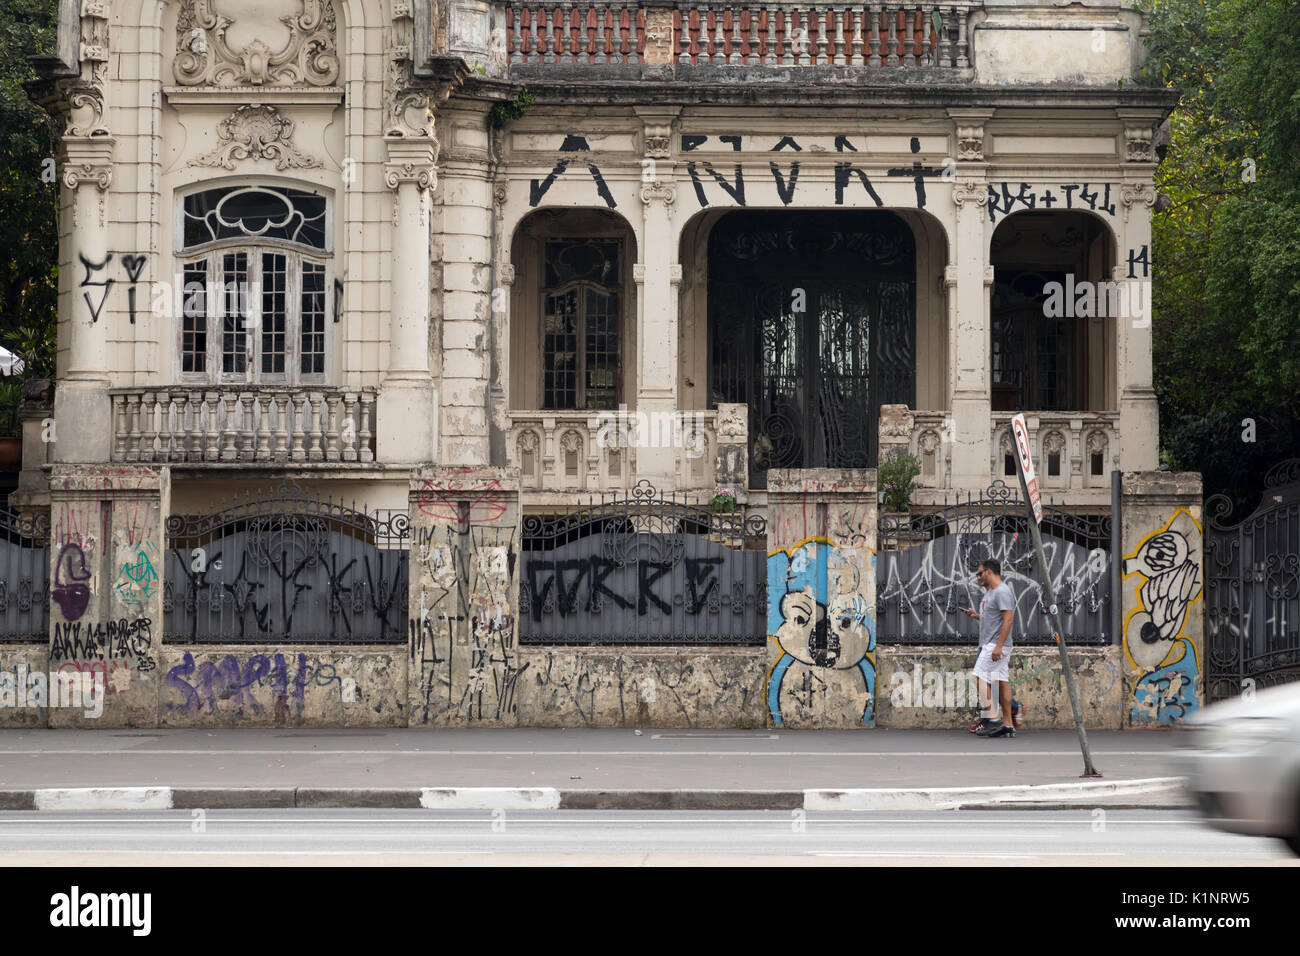 Pedestrians walk past Palacete Franco de Mello, Avenida Paulista, Sao Paulo, Brazil - Stock Image